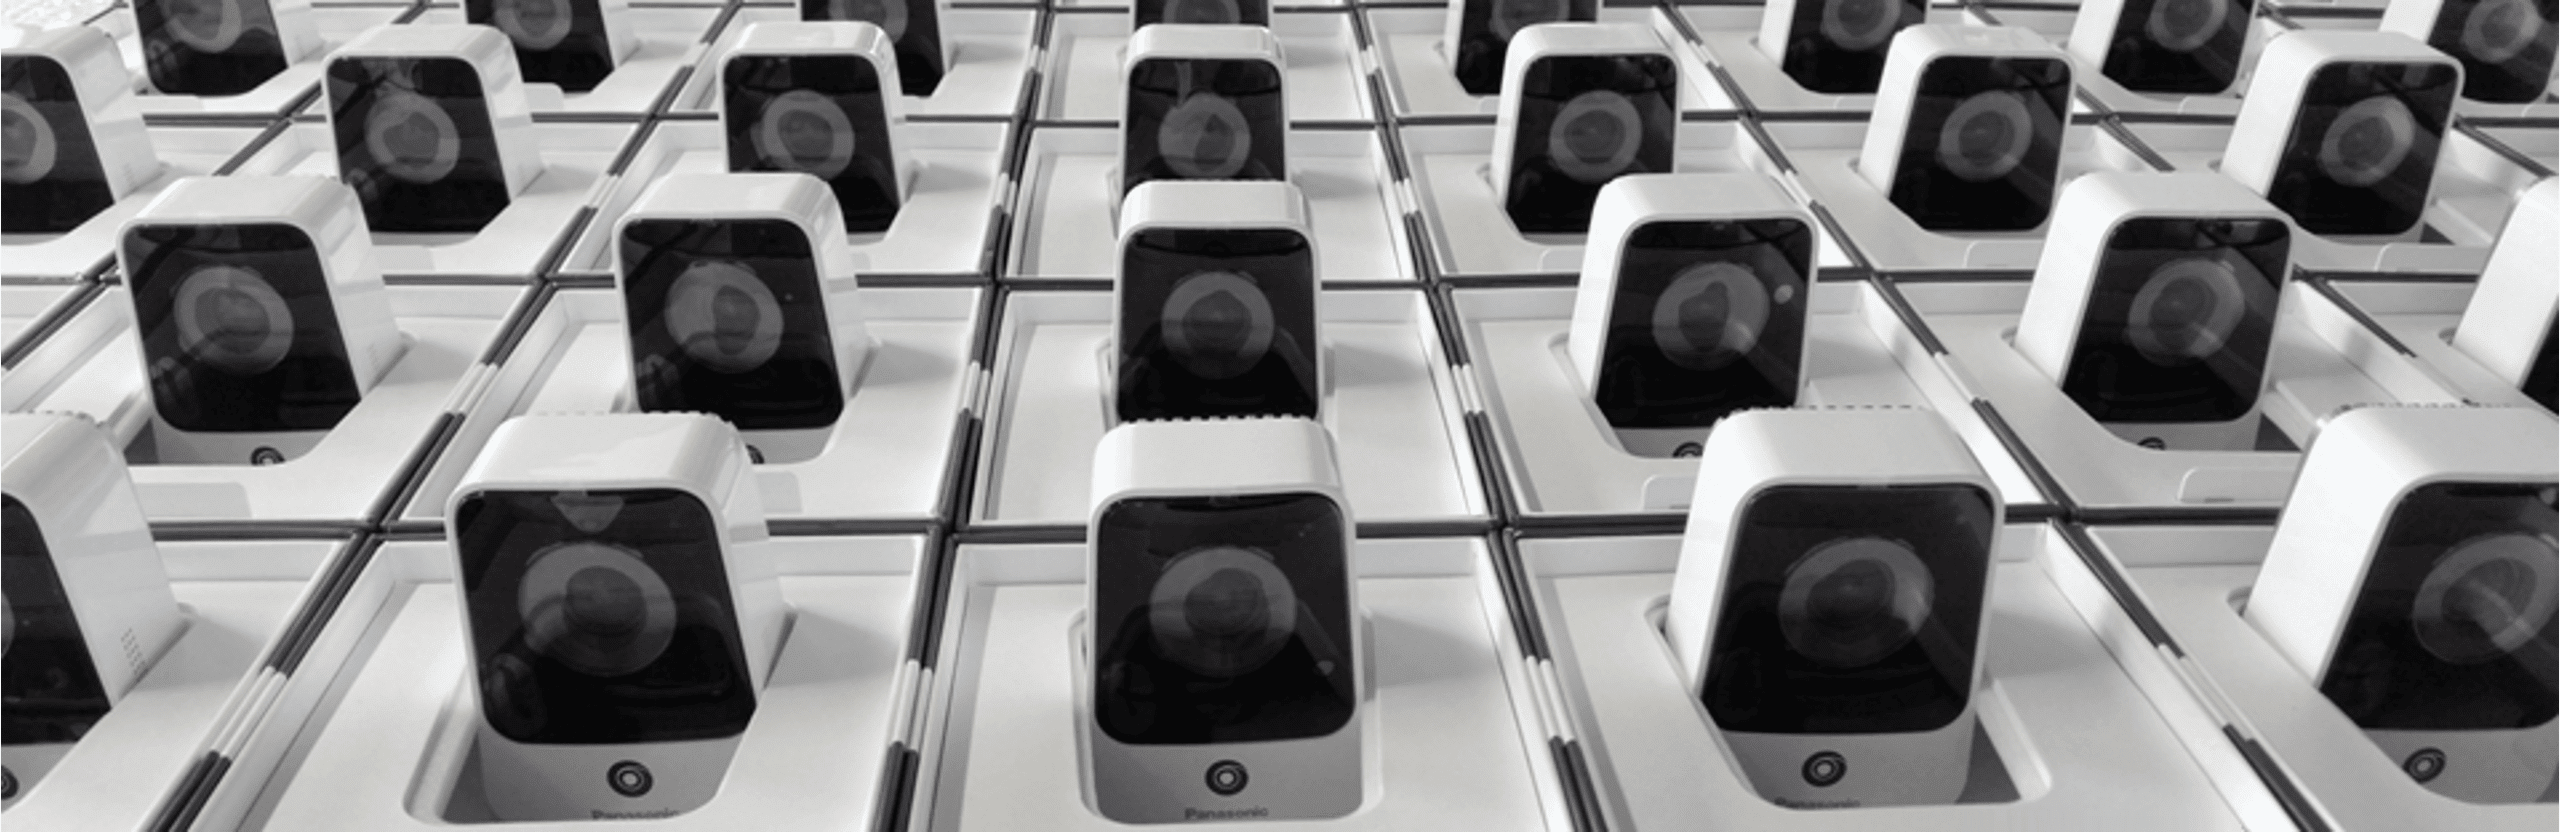 Panasonic nubo 4g security camera slimdesign smart product mass production